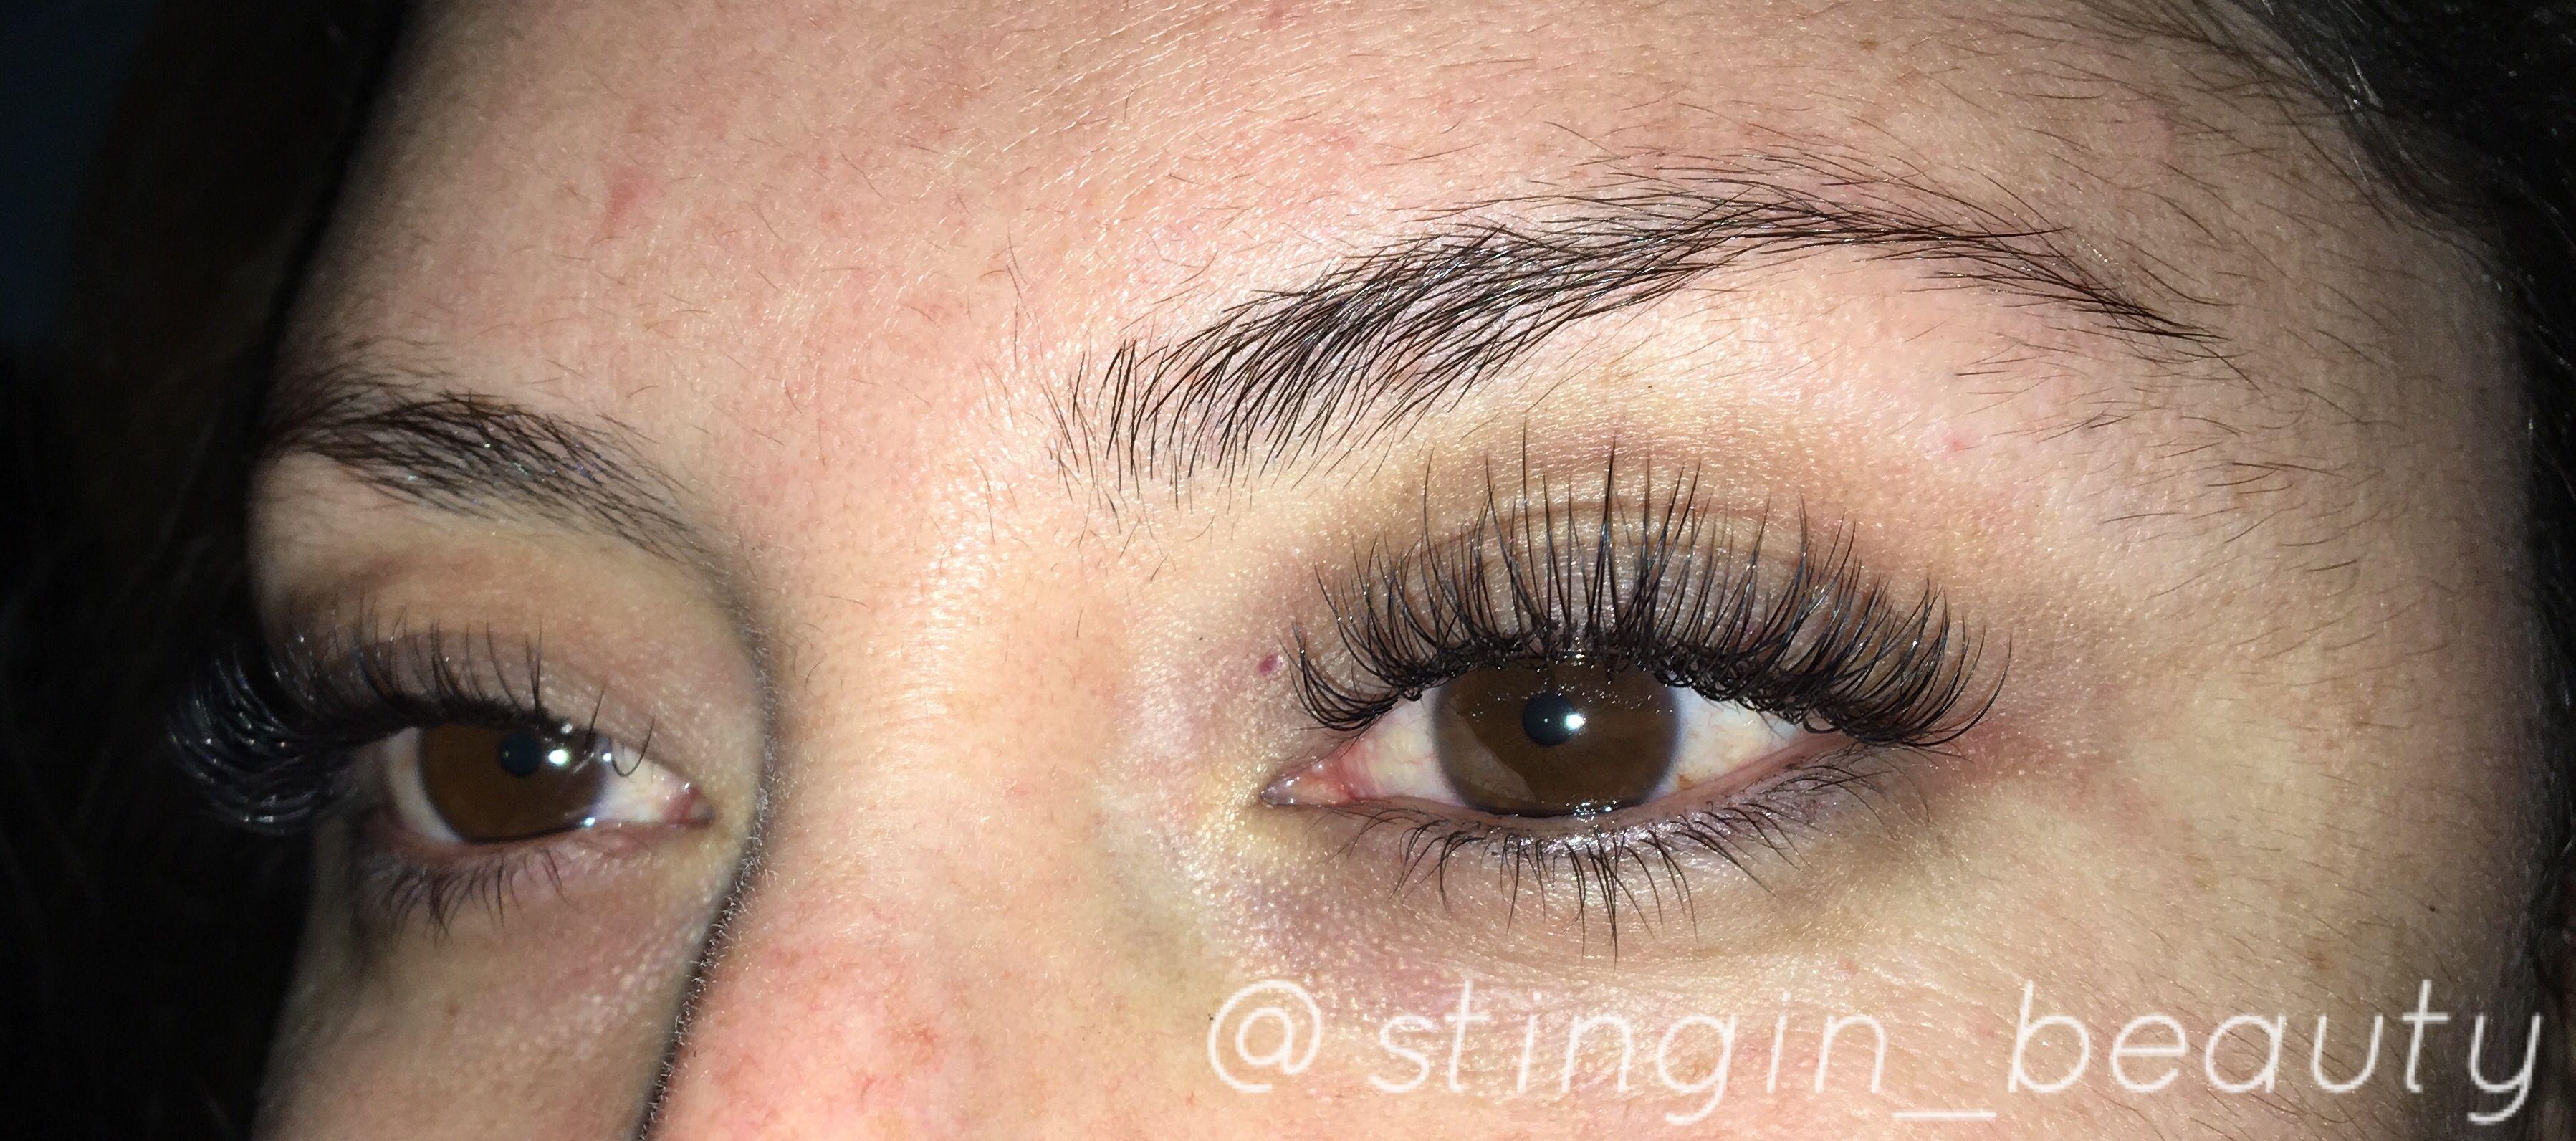 67633e09f1a Natural doll eye'd eyelash extensions | Lash extensions | Instagram ...